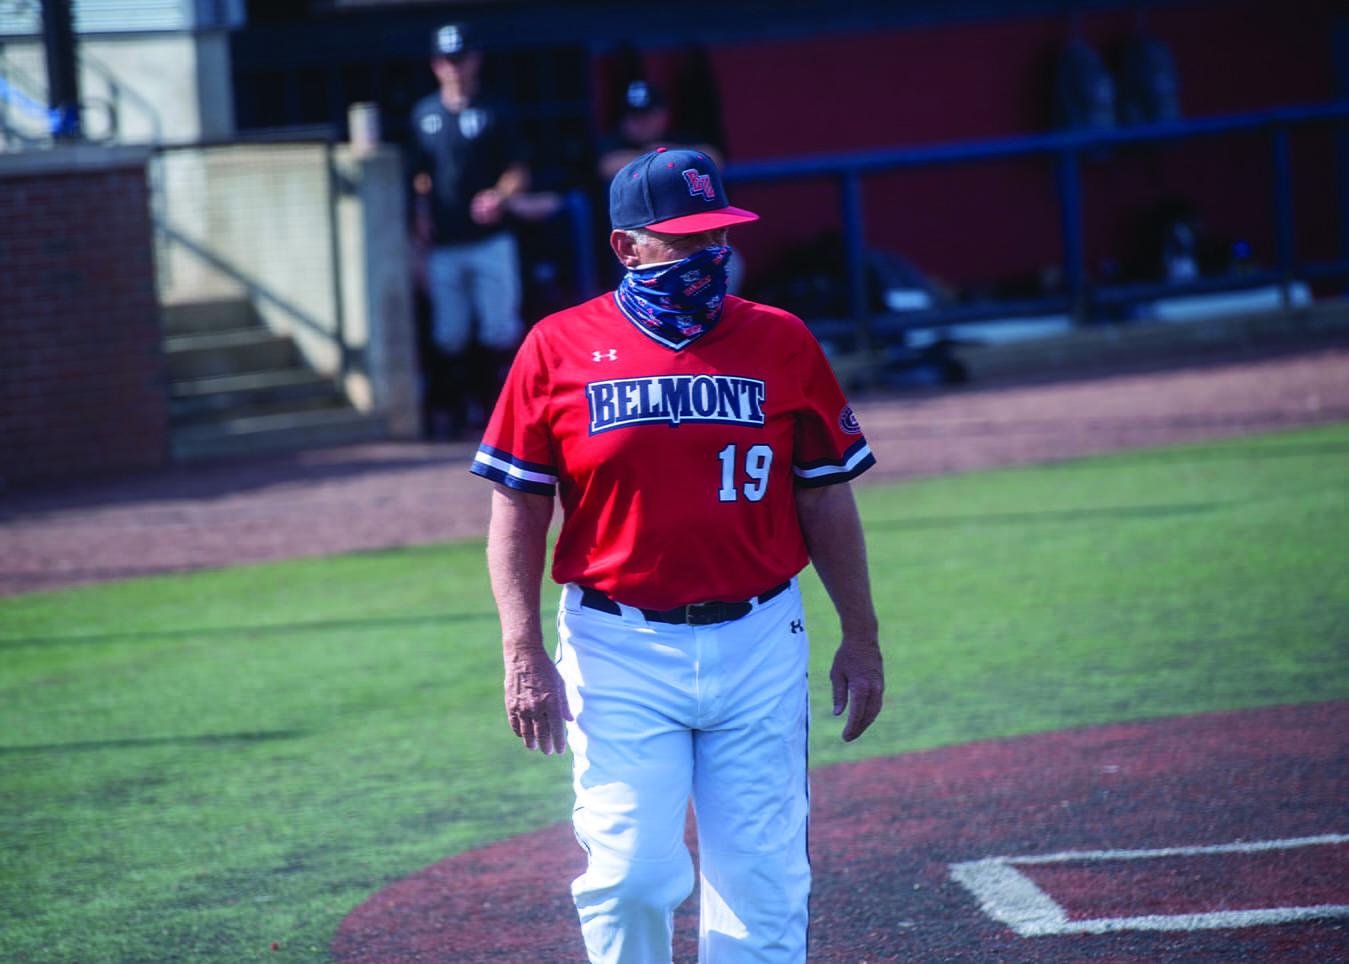 Baseball against Lipscomb at Rose Park at Belmont University in Nashville, Tennessee, April 6, 2021.